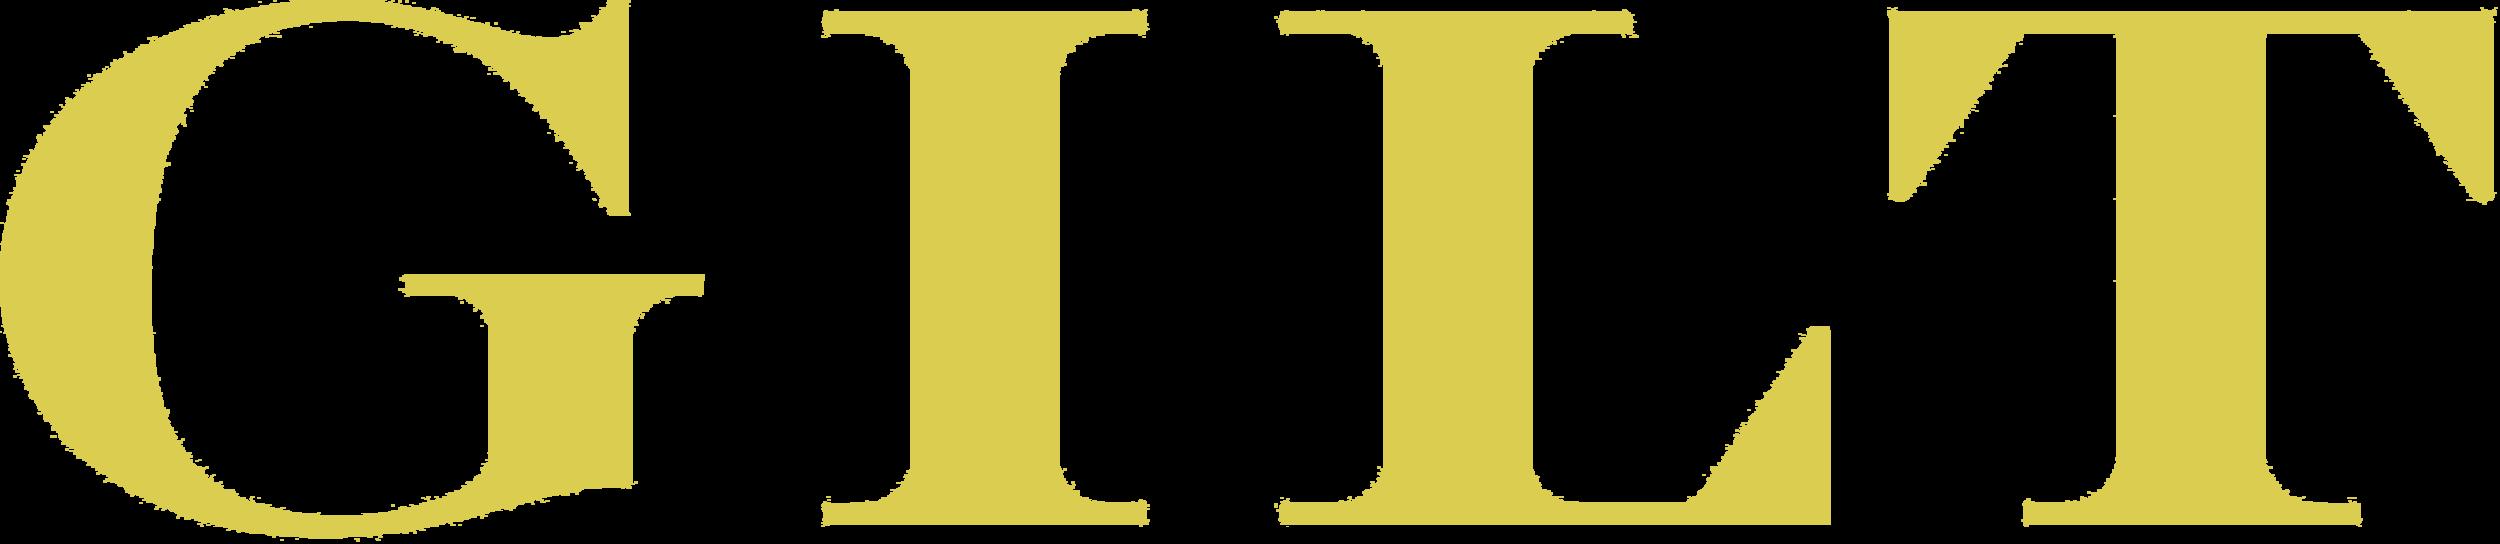 gilt-logo.png